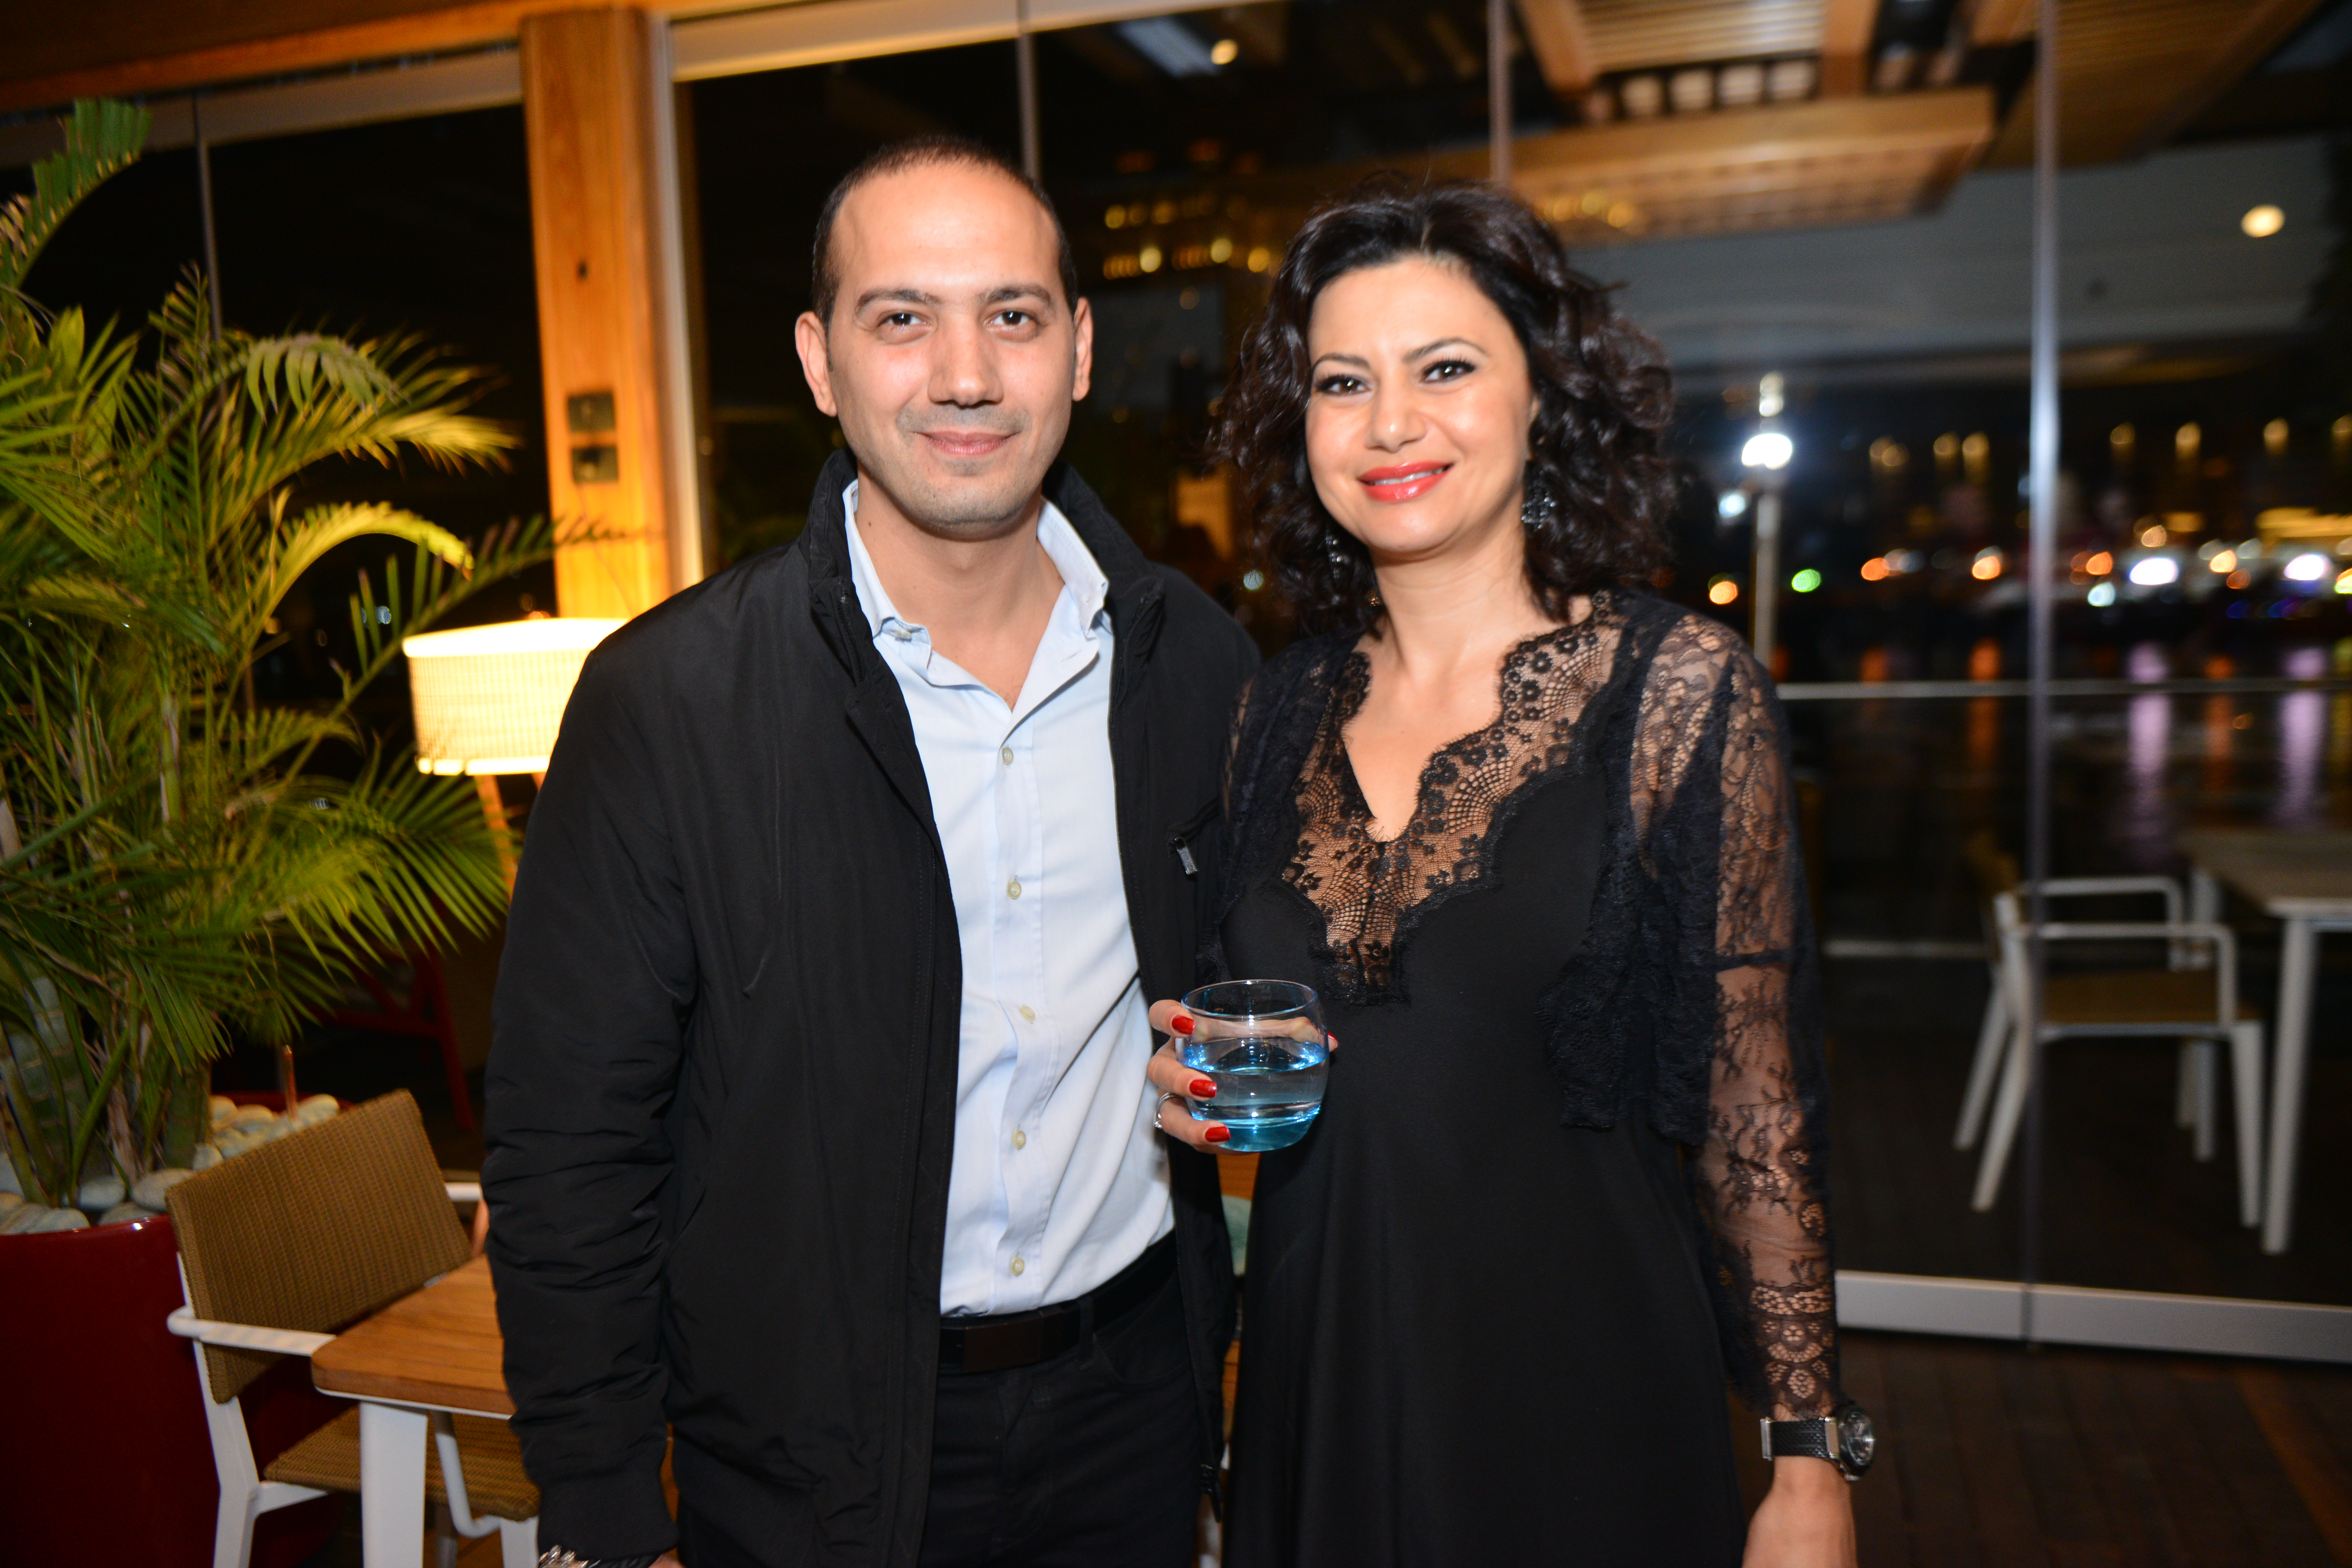 Mr. Amr Assem & Ms. Nadia Saady